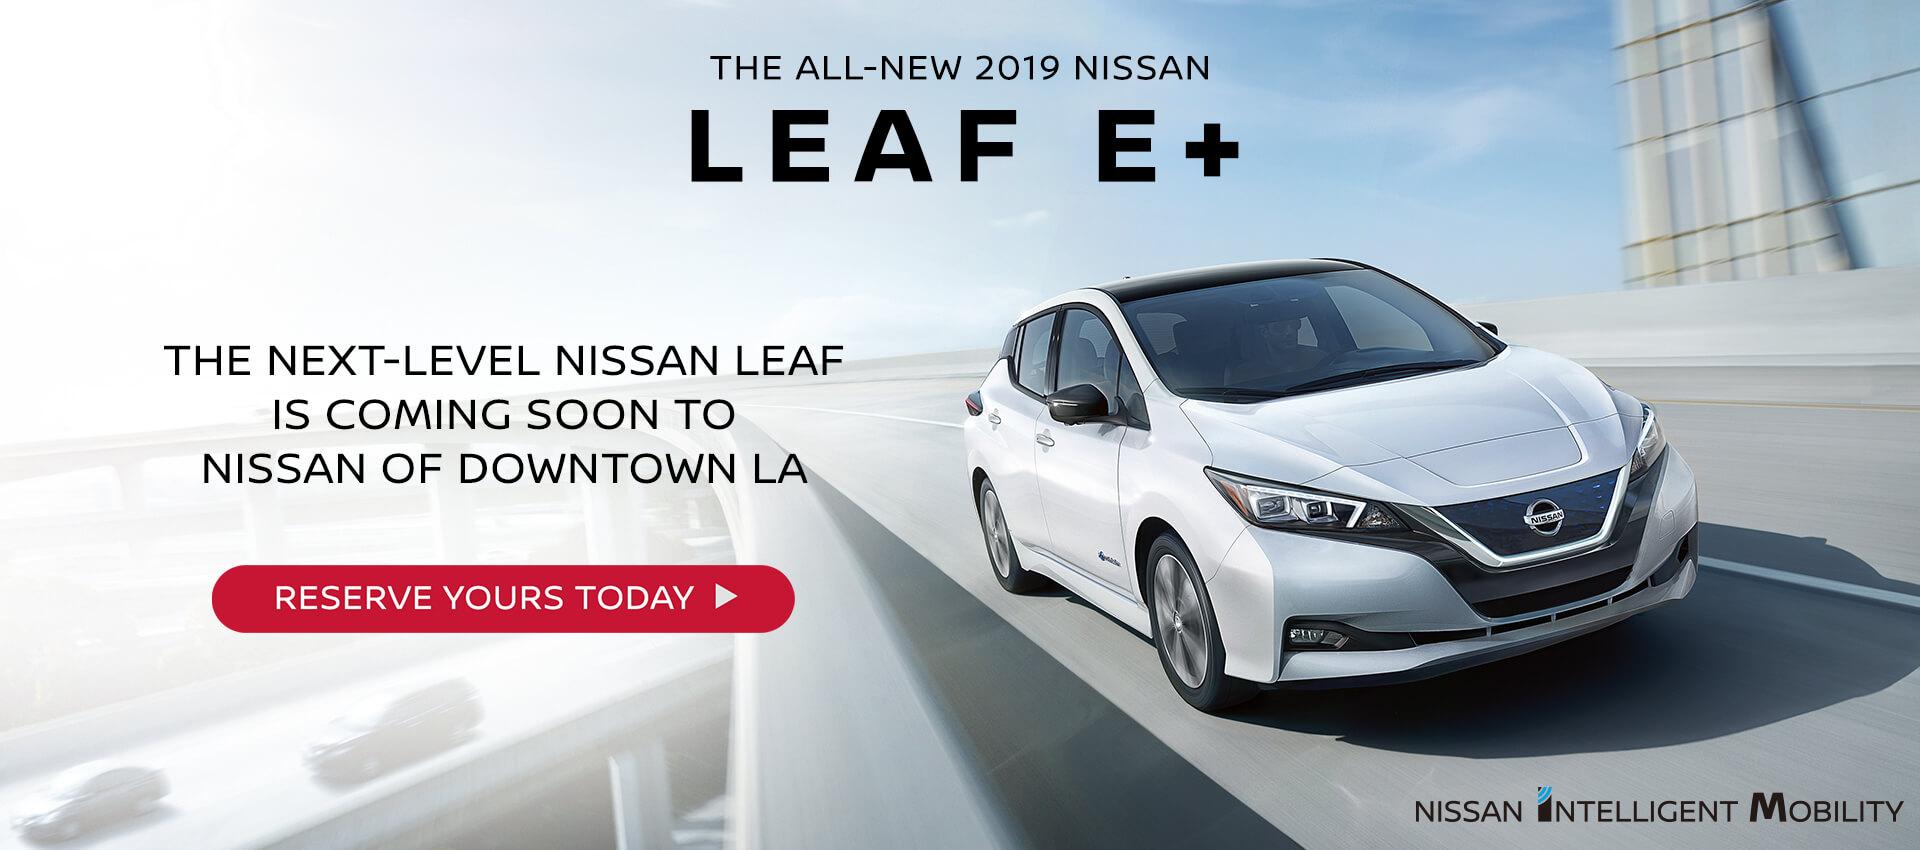 All New 2019 Leaf